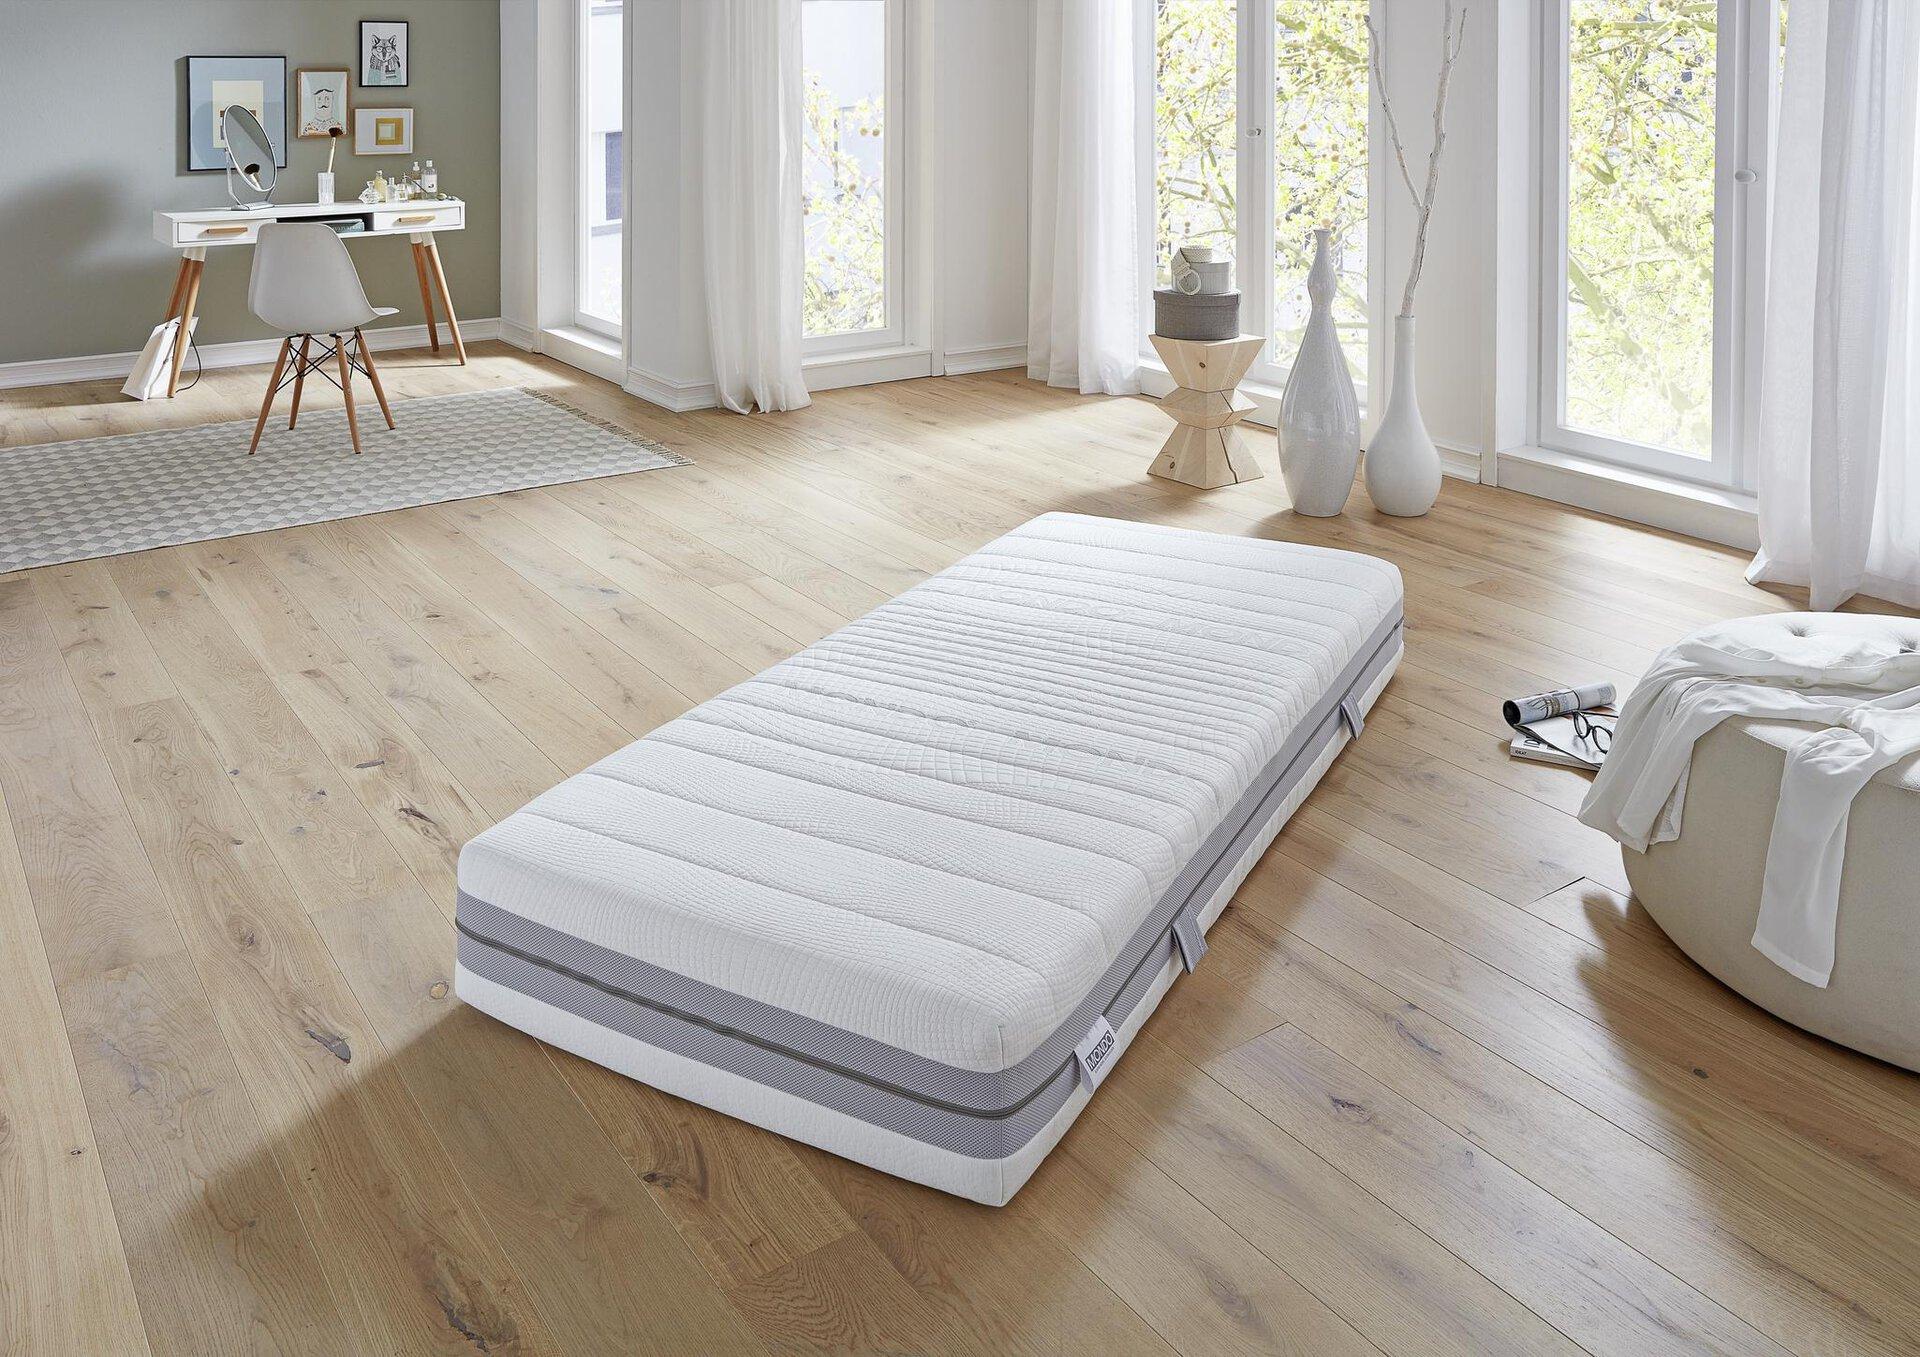 Matratze PERFECT NIGHT PLUS MONDO Textil weiß 200 x 25 x 90 cm